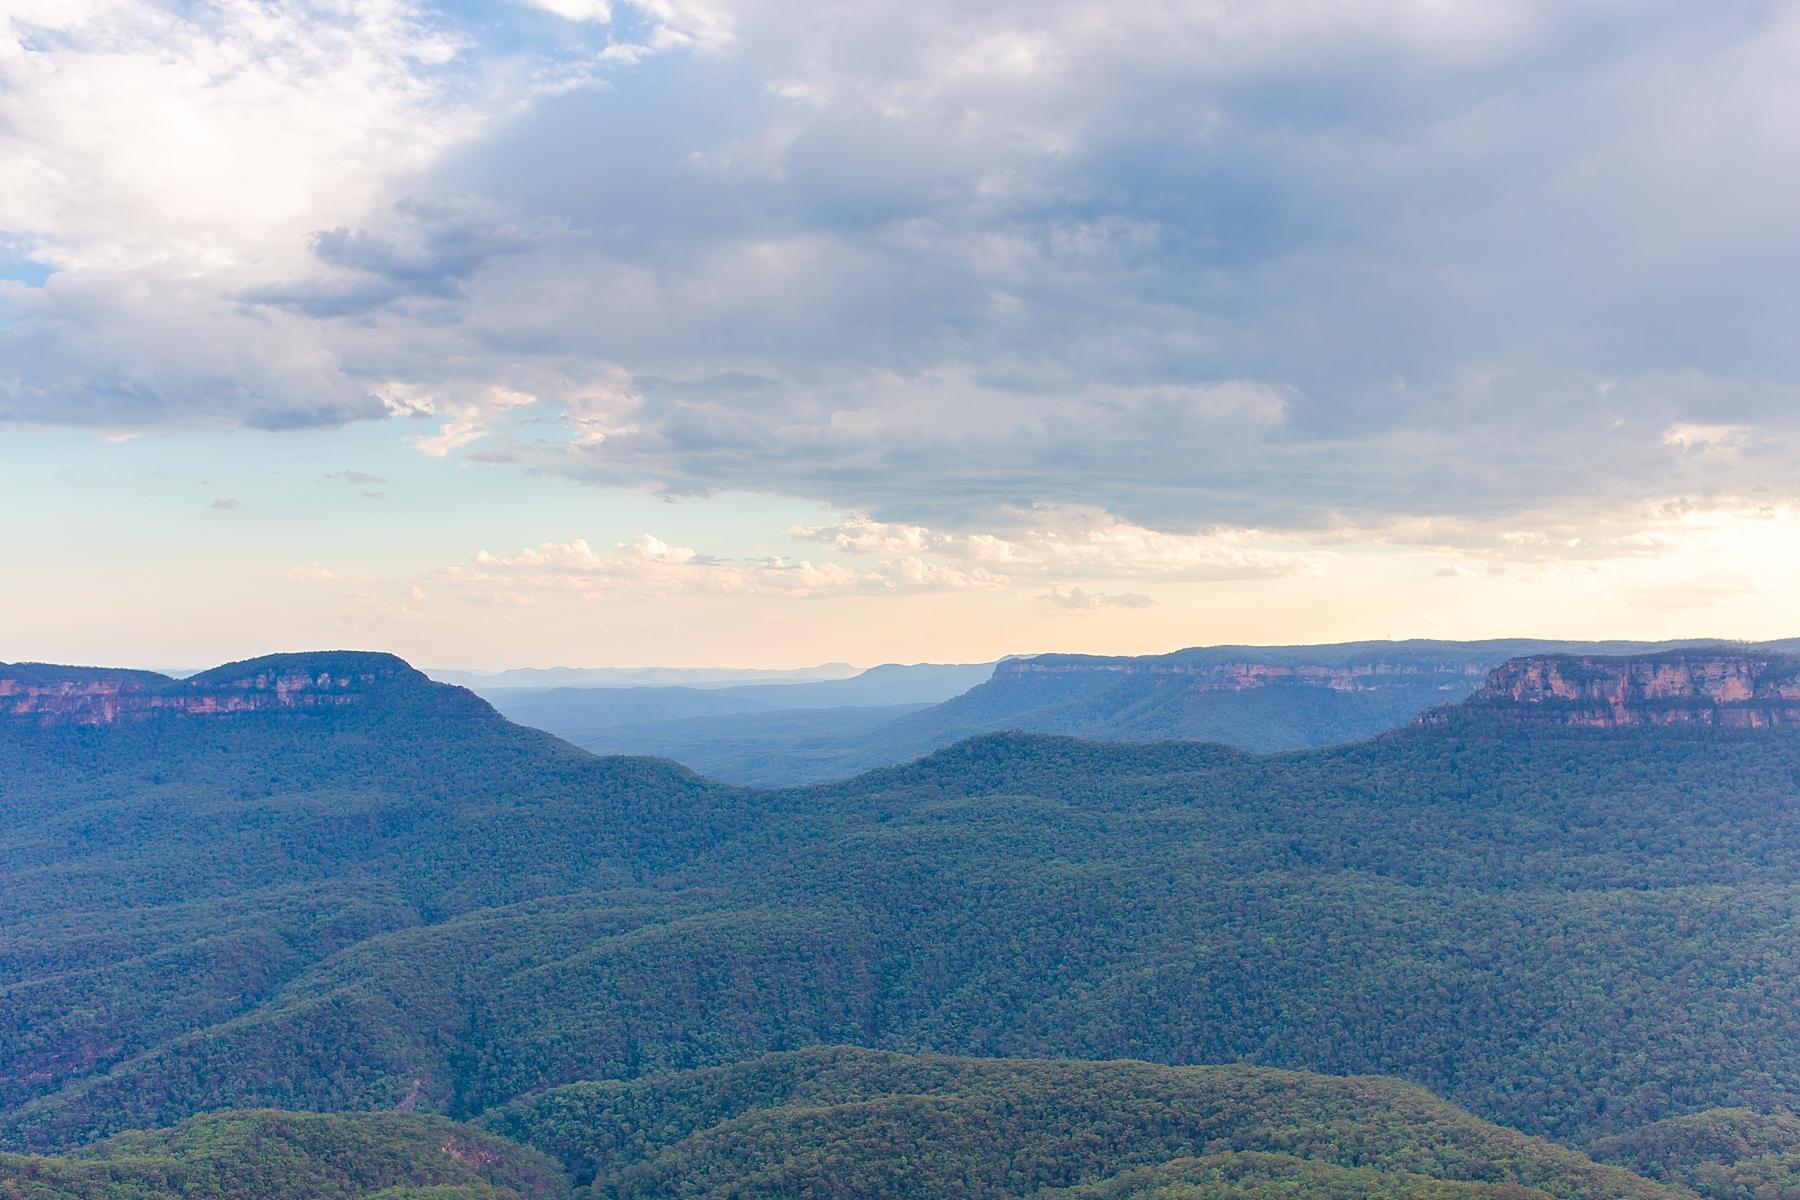 blue-mountains-australia-scenery_0131.jpg